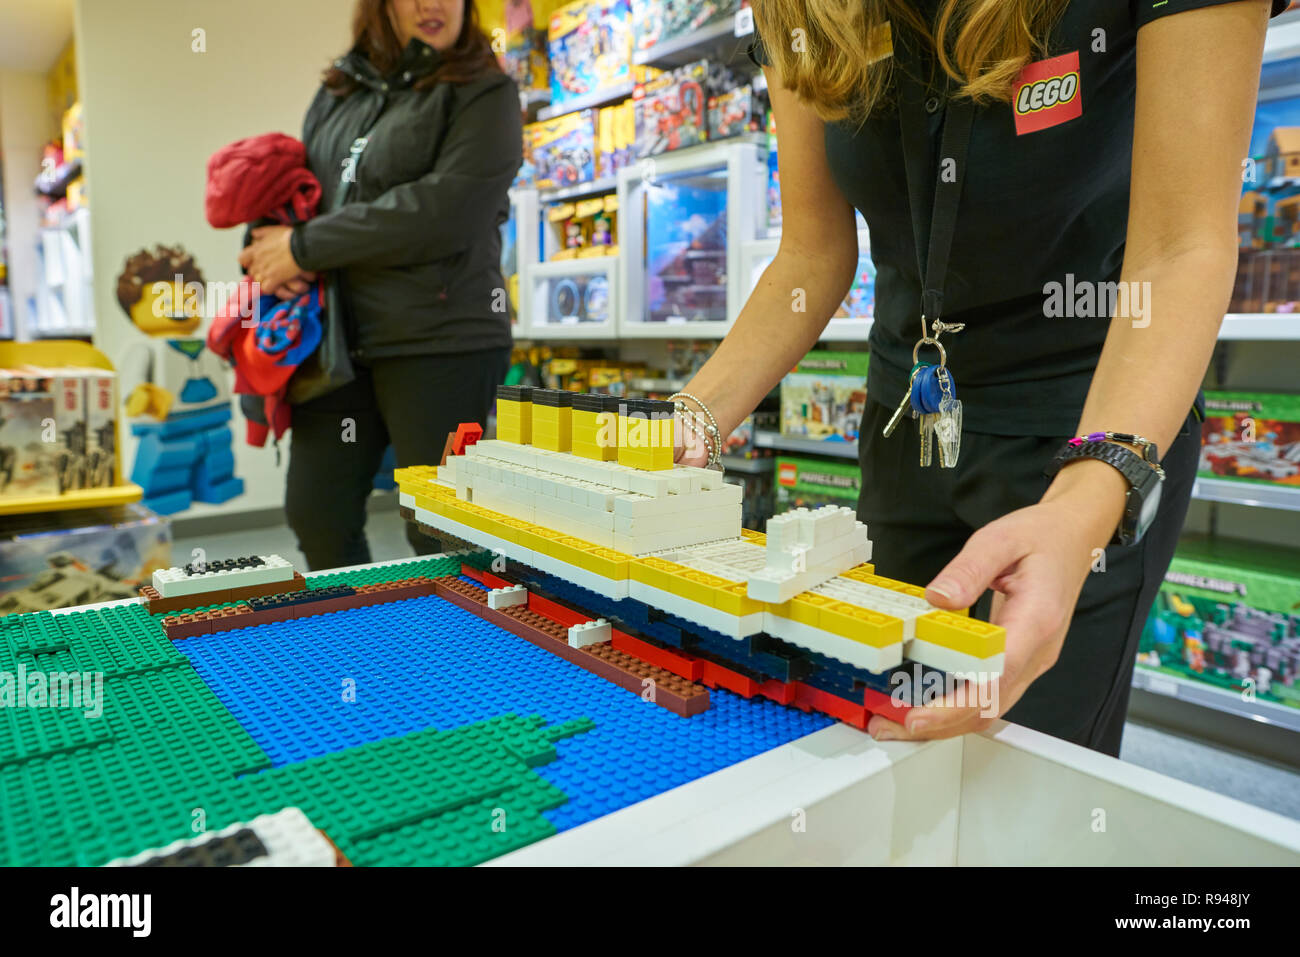 Circa Magasin MilanItalie L'intérieur Lego 2017NovembreÀ Du EHD9YW2I